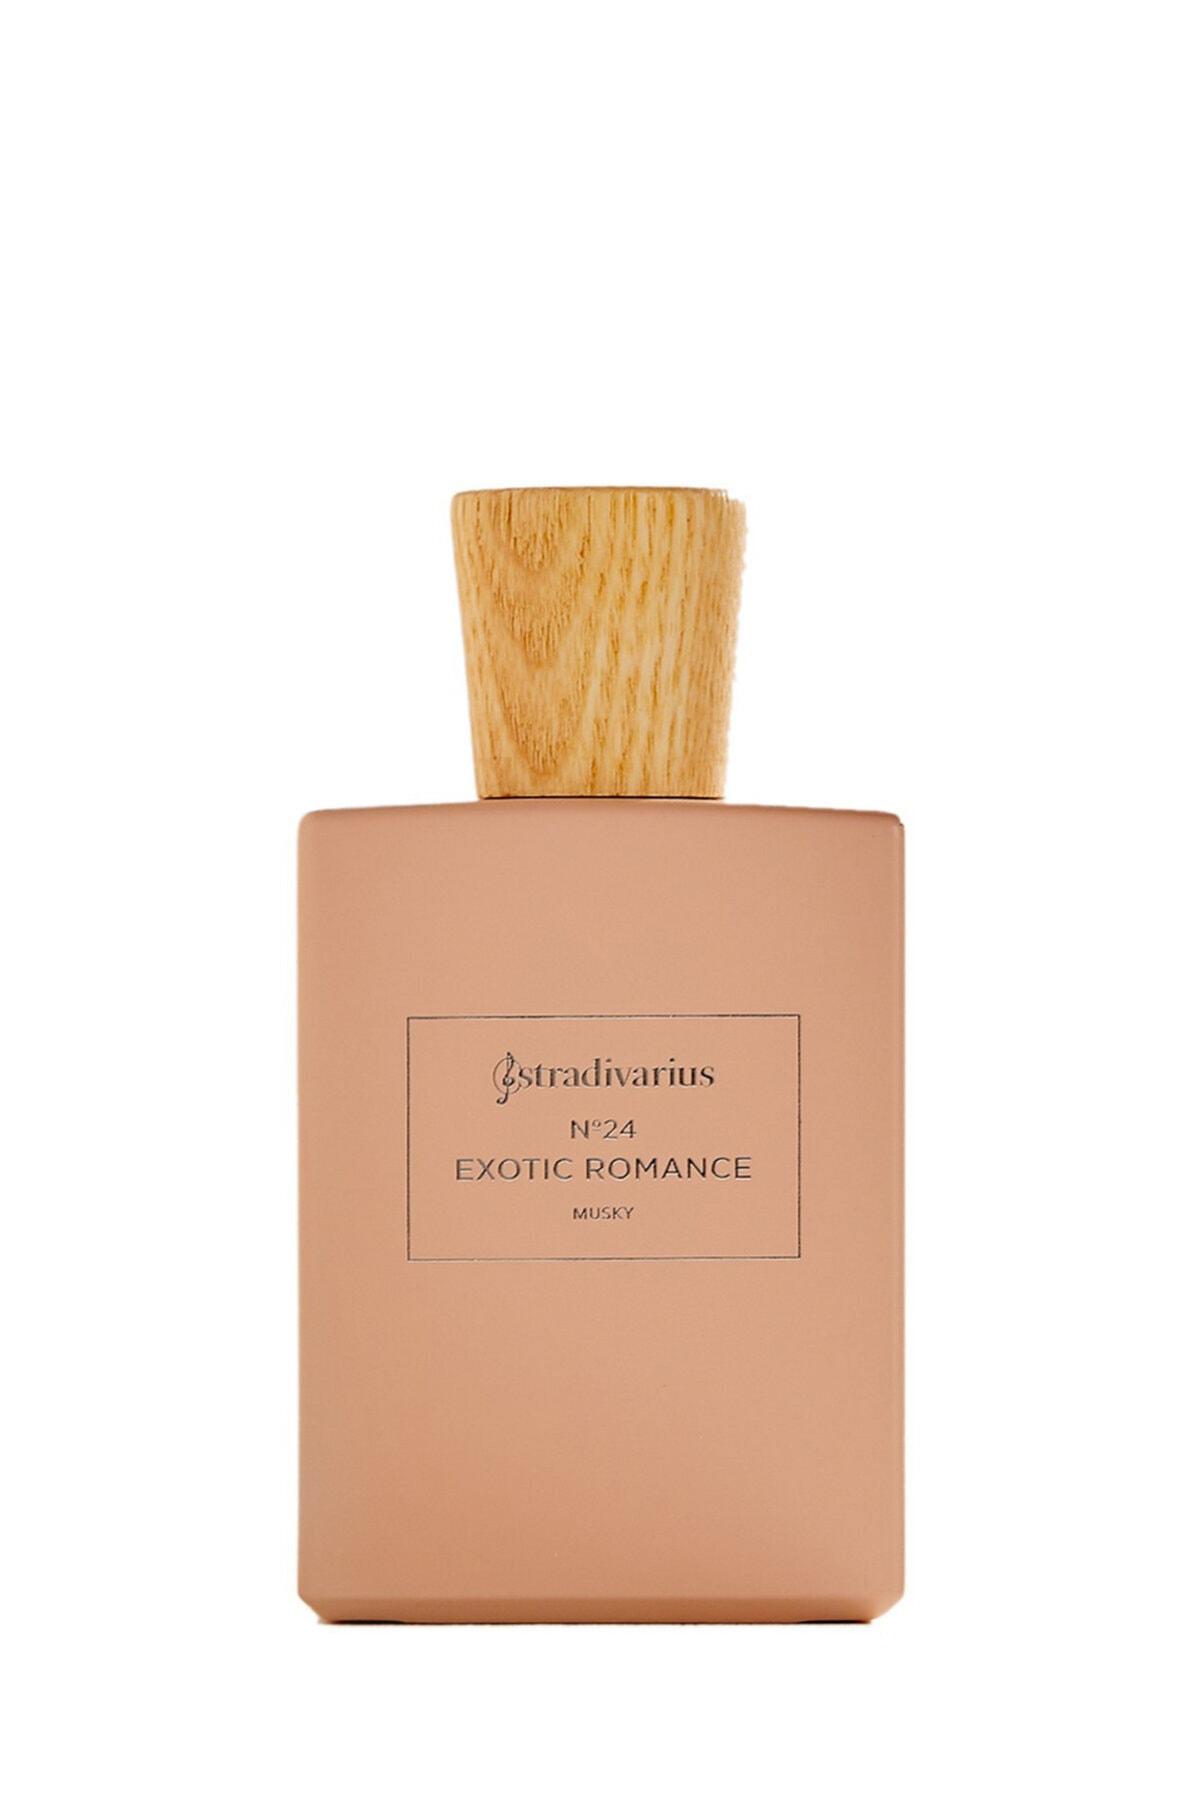 Stradivarius Kadın Nº 134 Romance Eau De Toilette 100 Ml 04311056 1